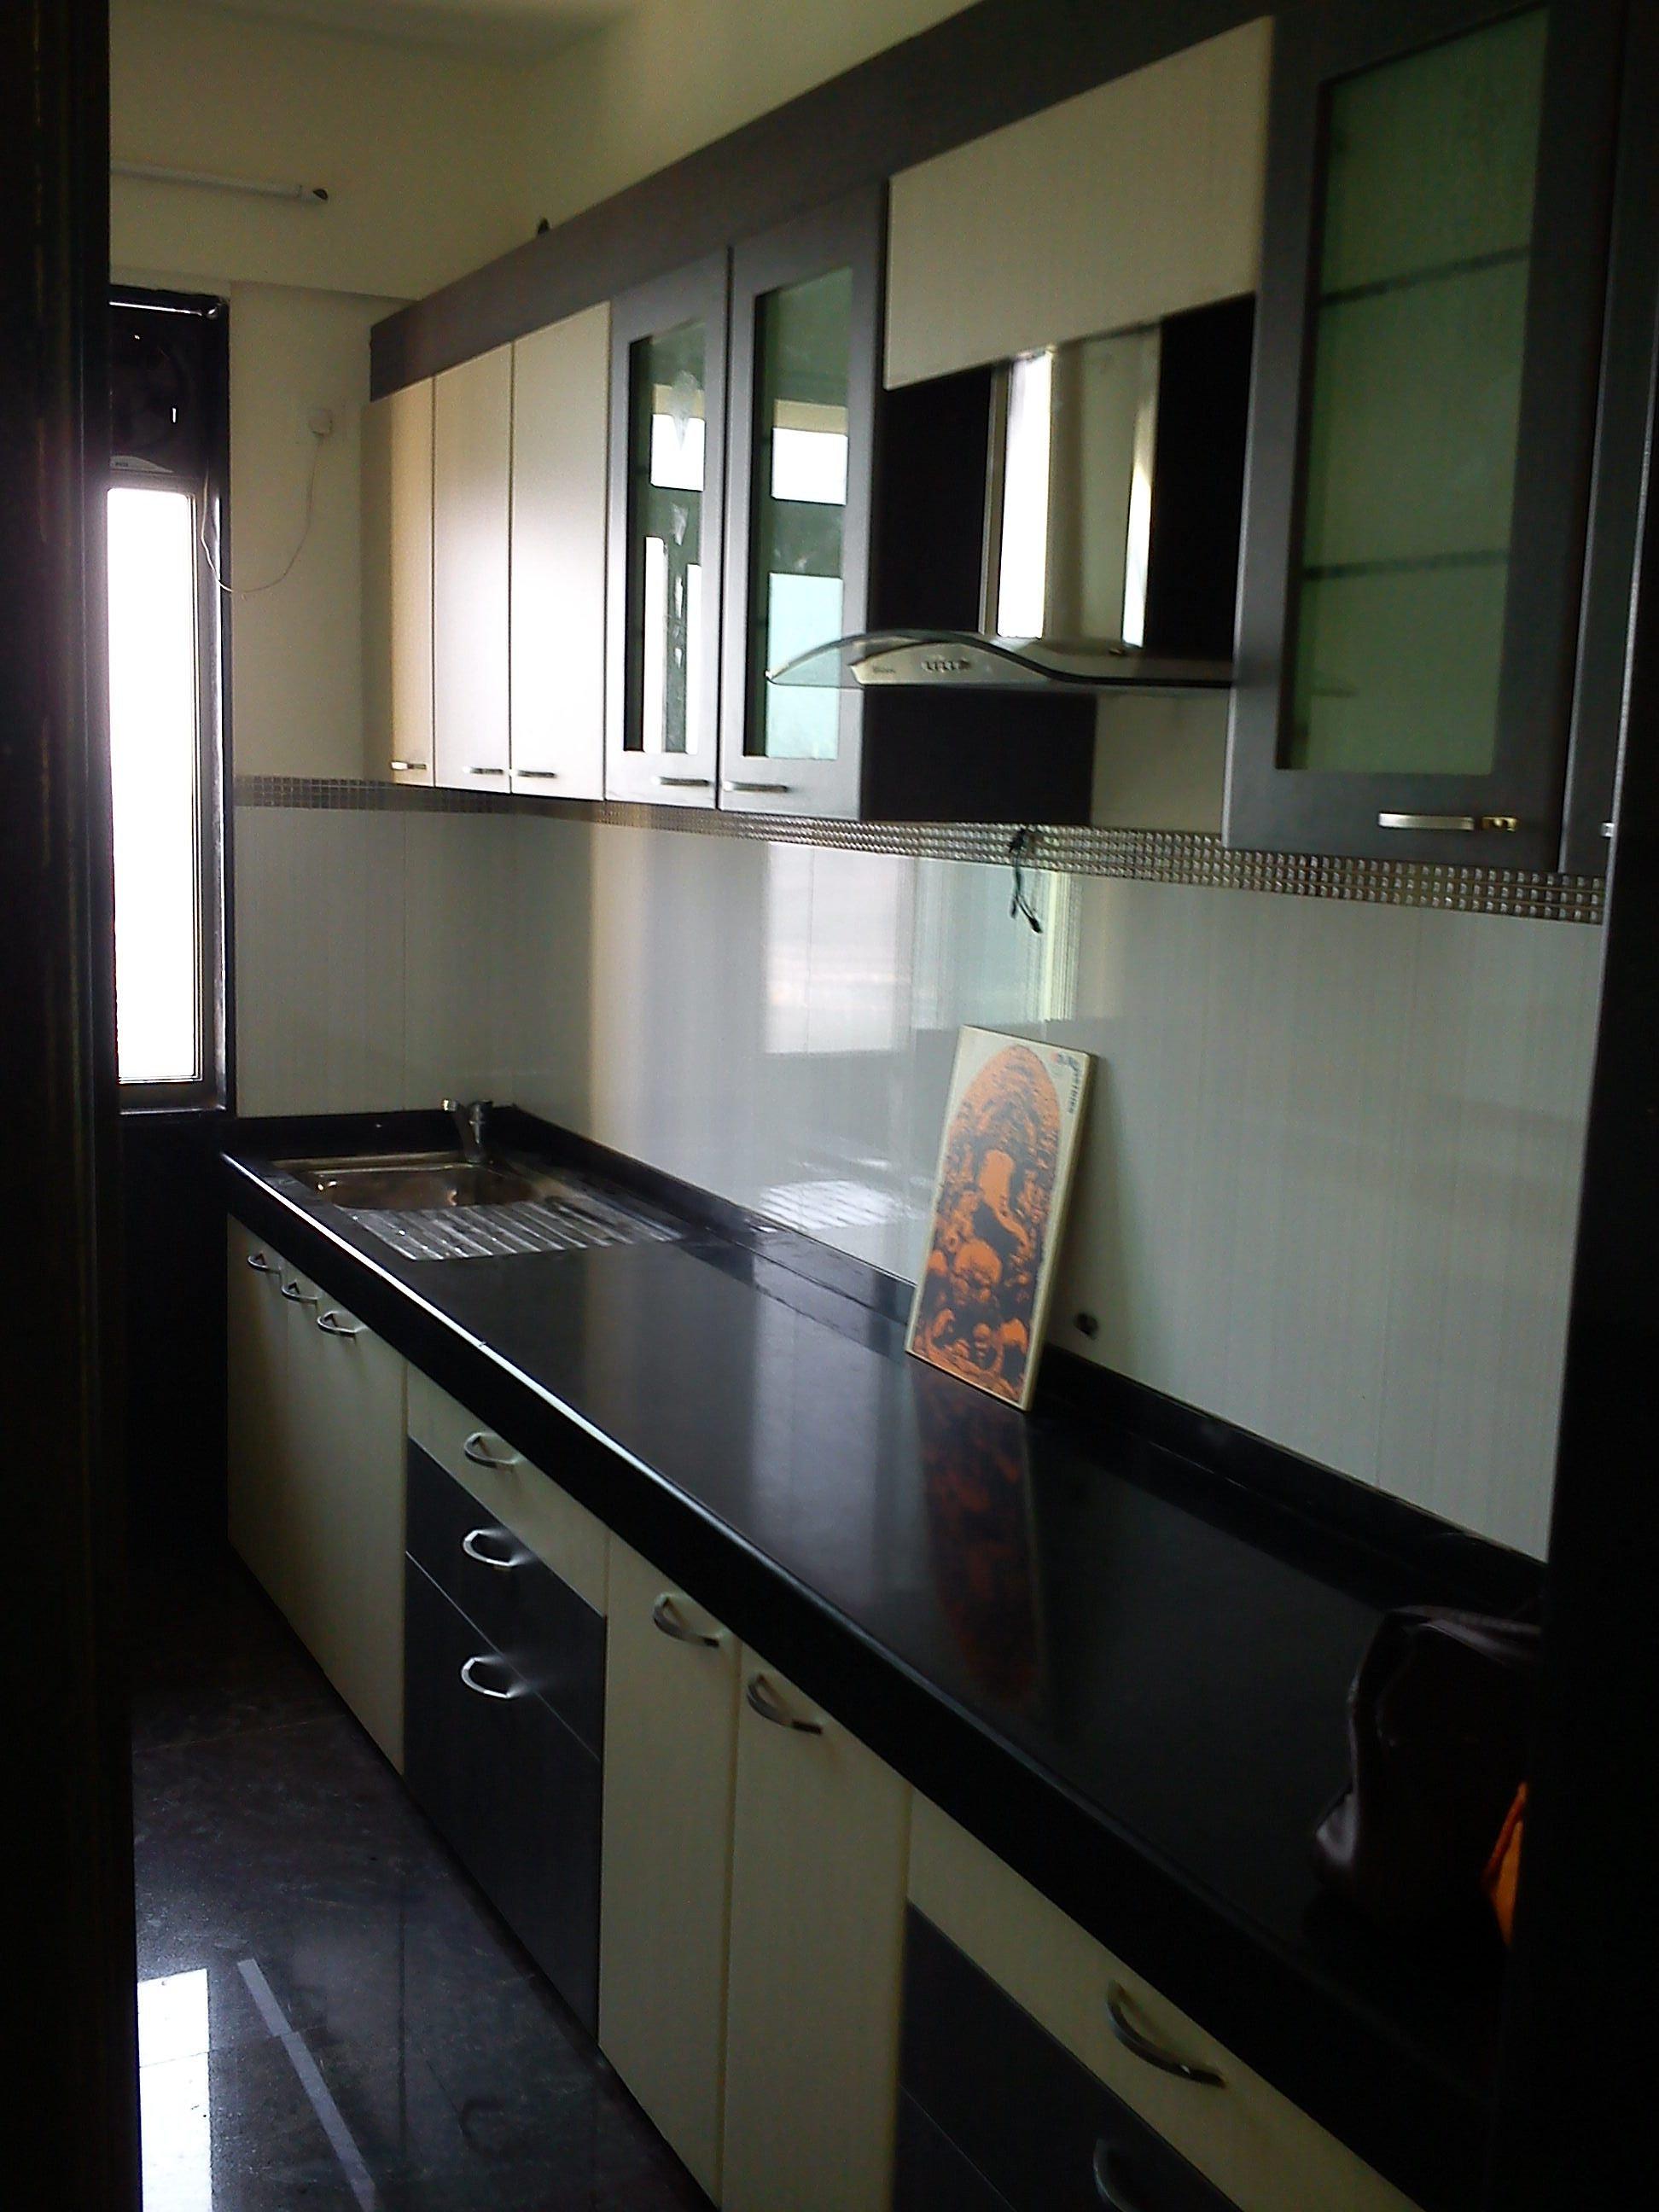 Modular kitchen mumbai laviishups dsc01058g create your wix site you can do it yourself start now solutioingenieria Gallery